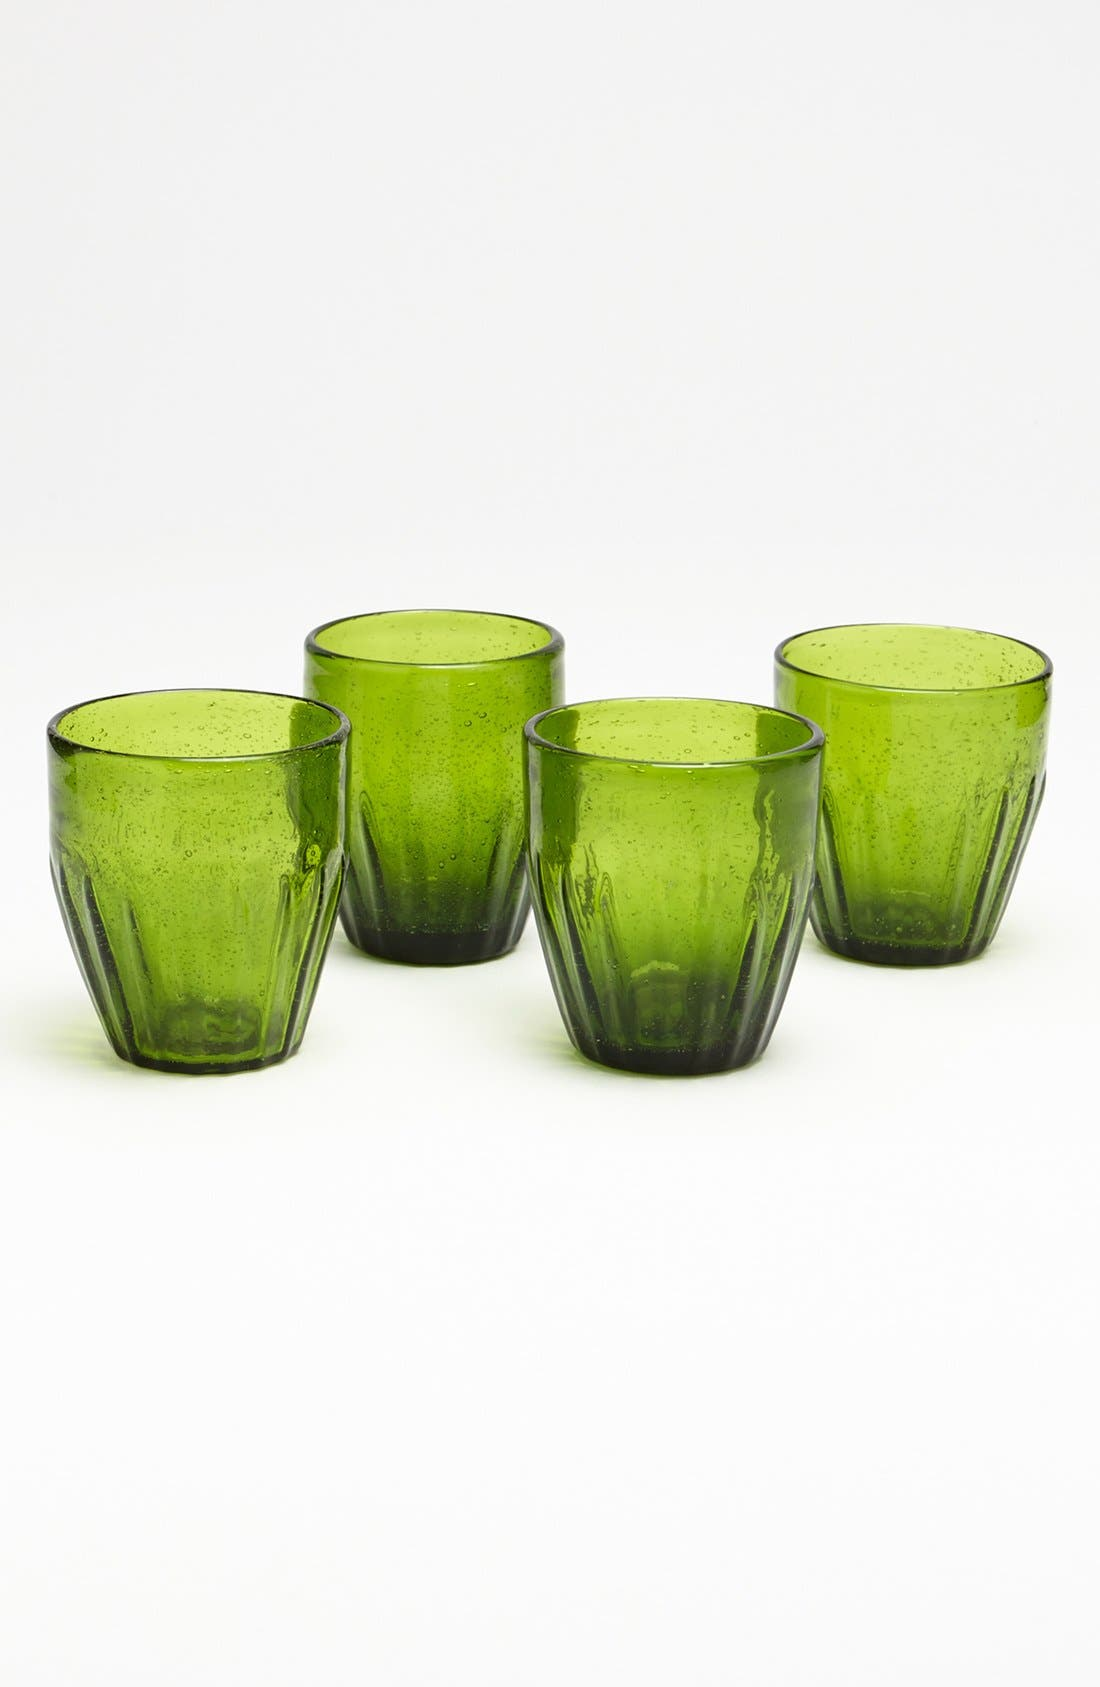 Main Image - Rustic Green Glass Tumblers (Set of 4)